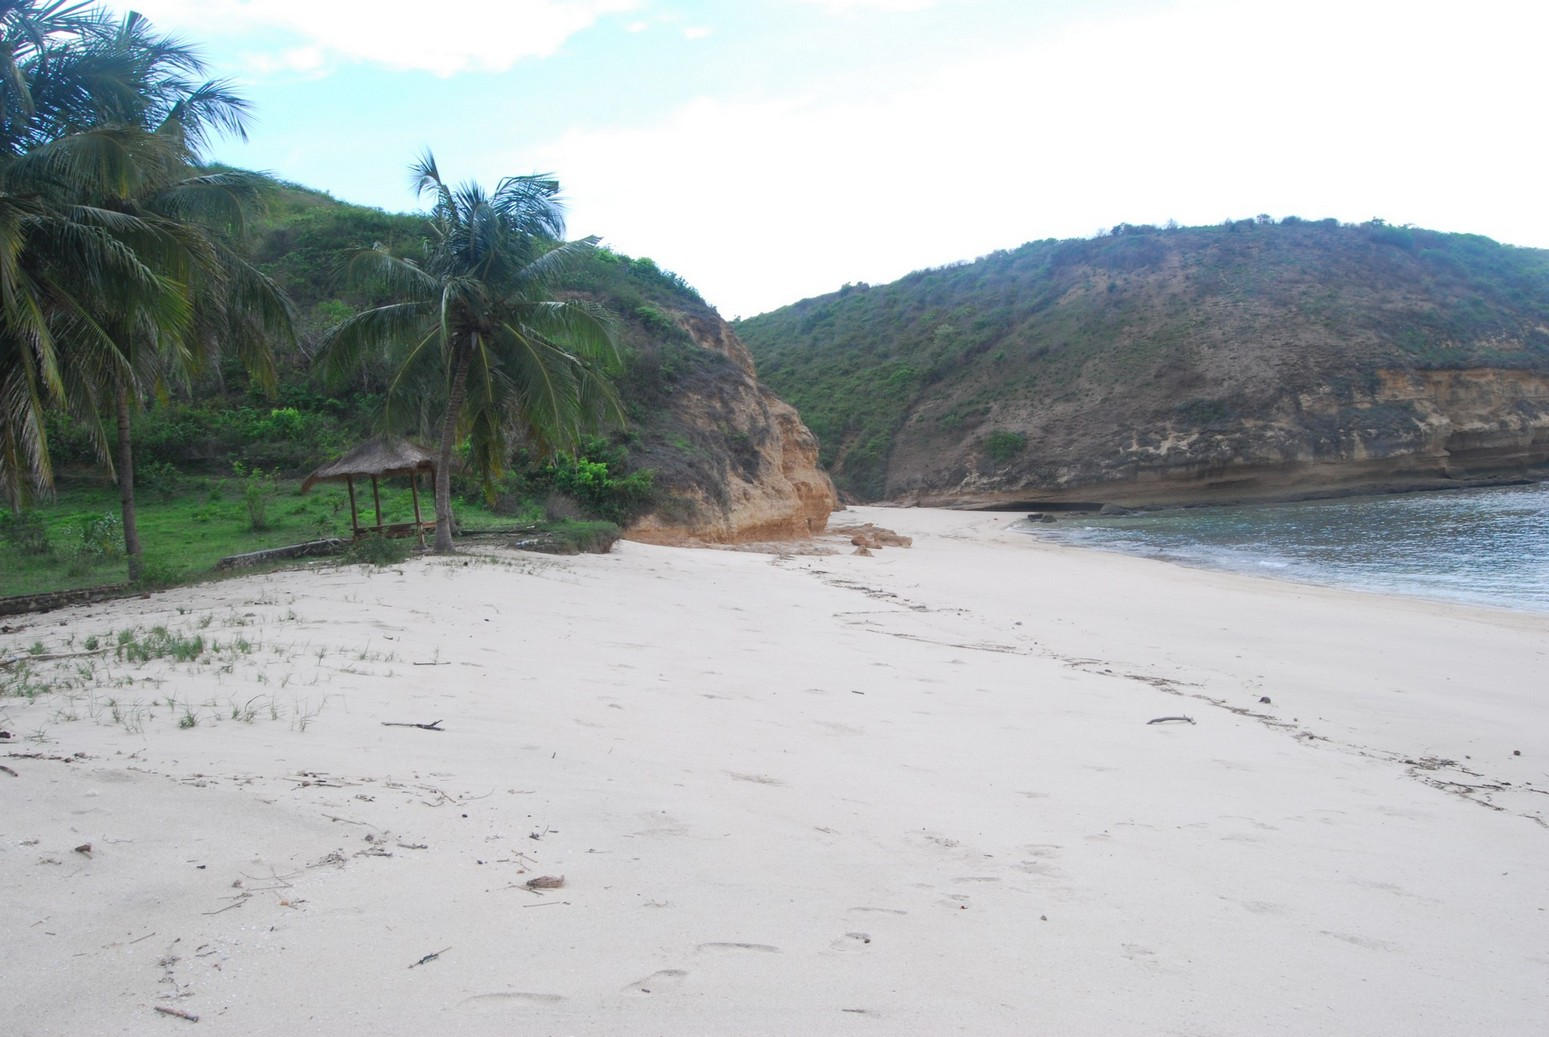 informationen ber urlaub in bali und umgebung surga beach lombok. Black Bedroom Furniture Sets. Home Design Ideas